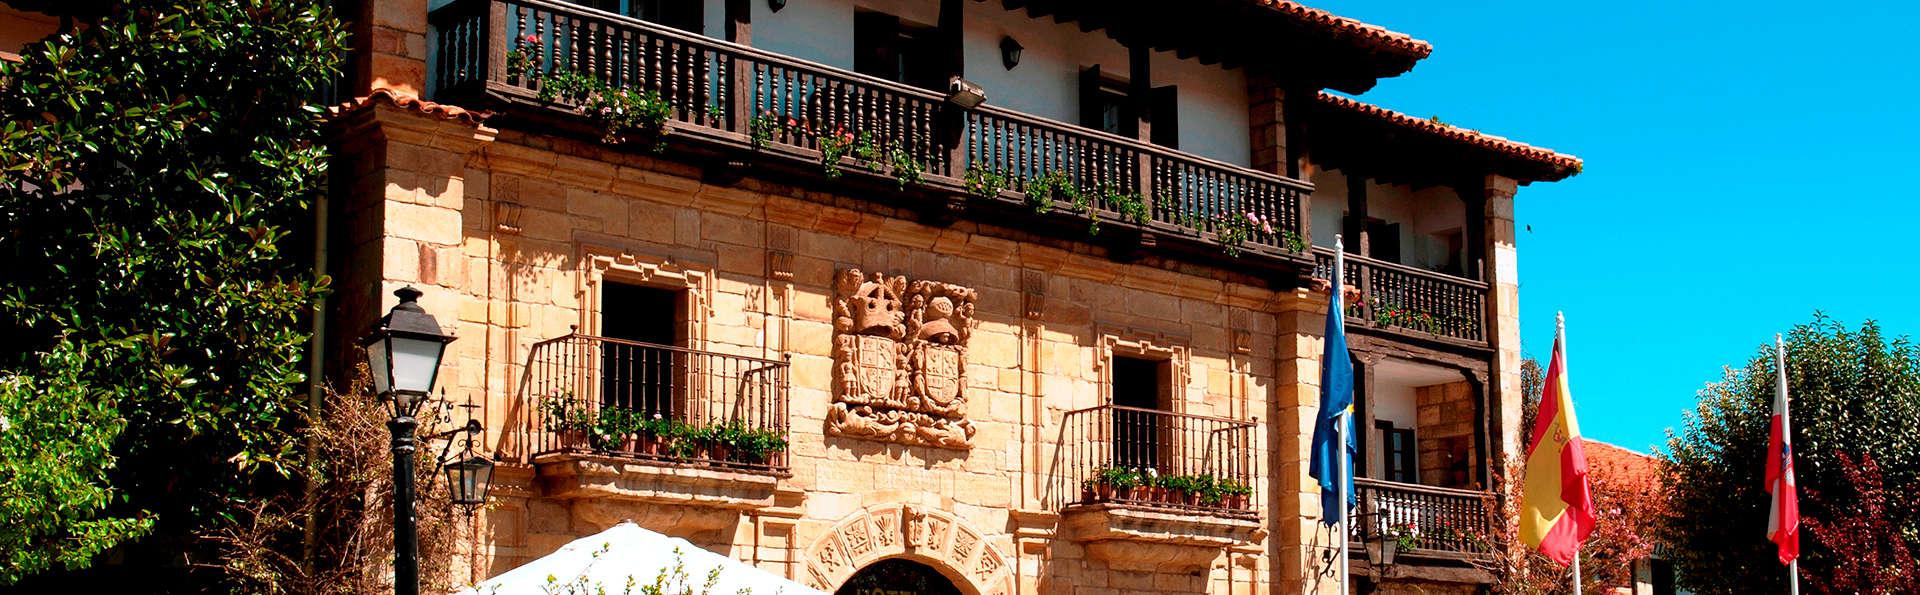 Hotel Los Infantes - Edit_Front.jpg